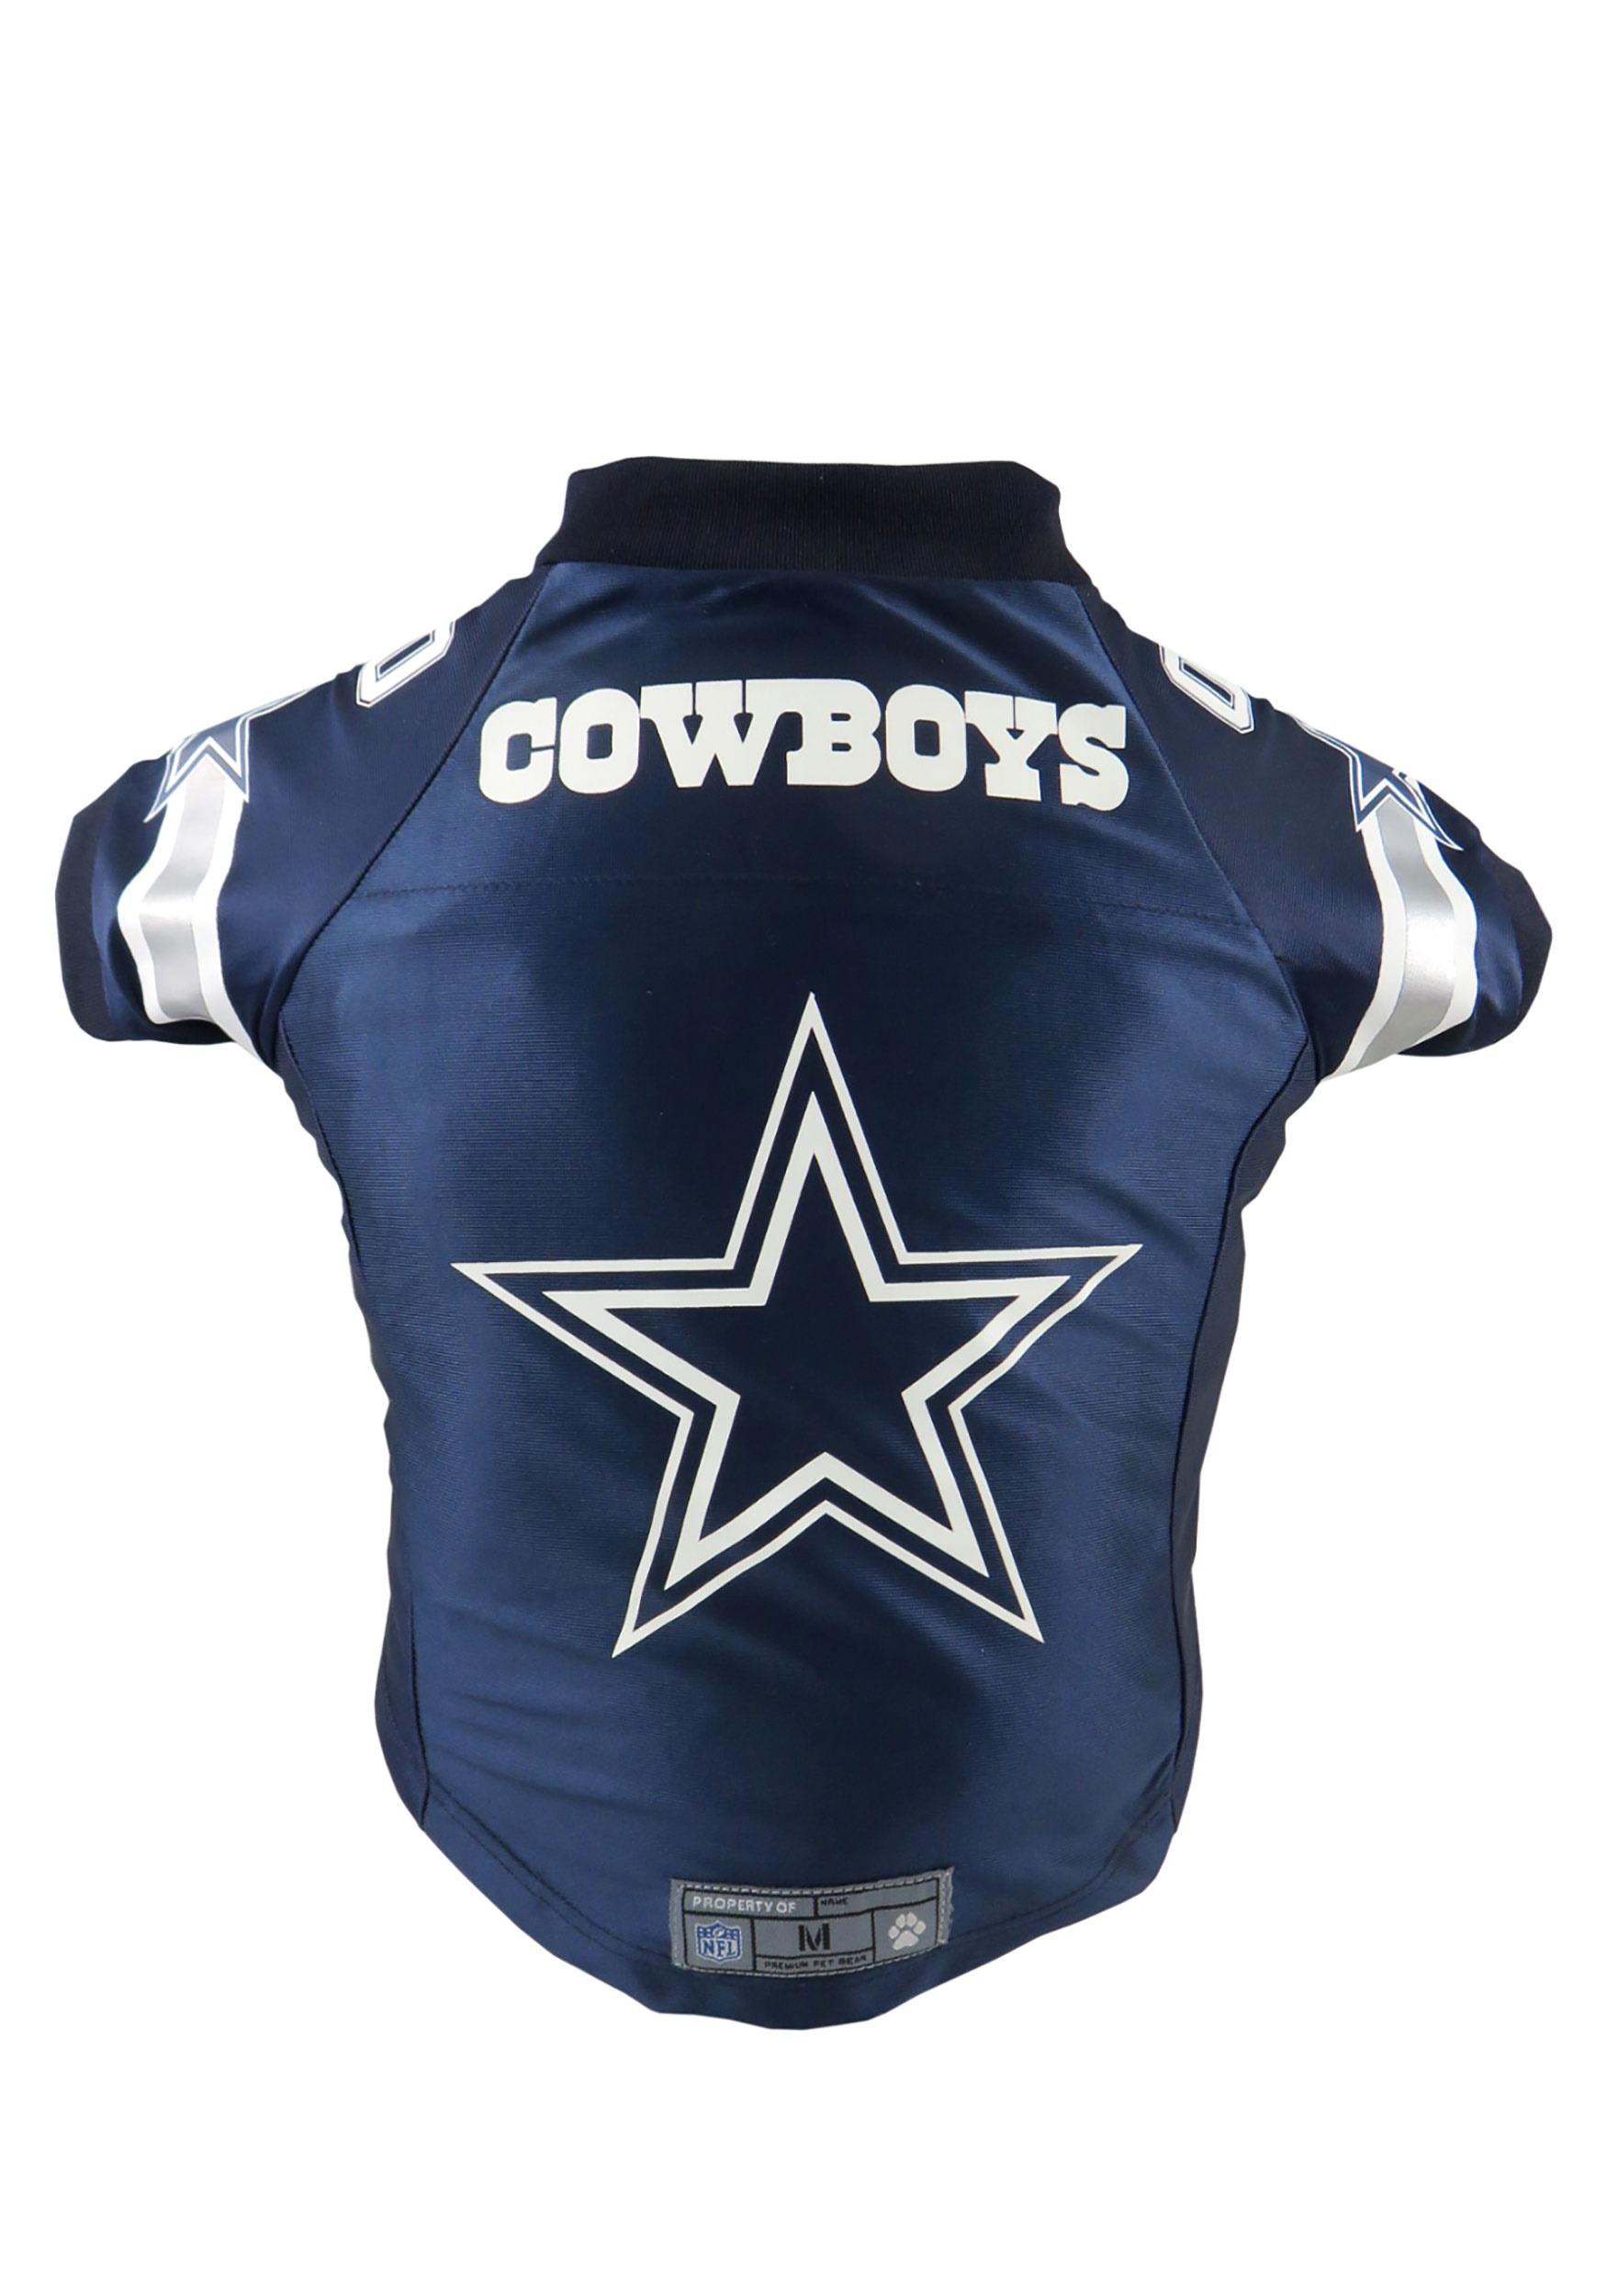 buy online 3e5c8 4d0fa NFL Dallas Cowboys Premium Pet Jersey